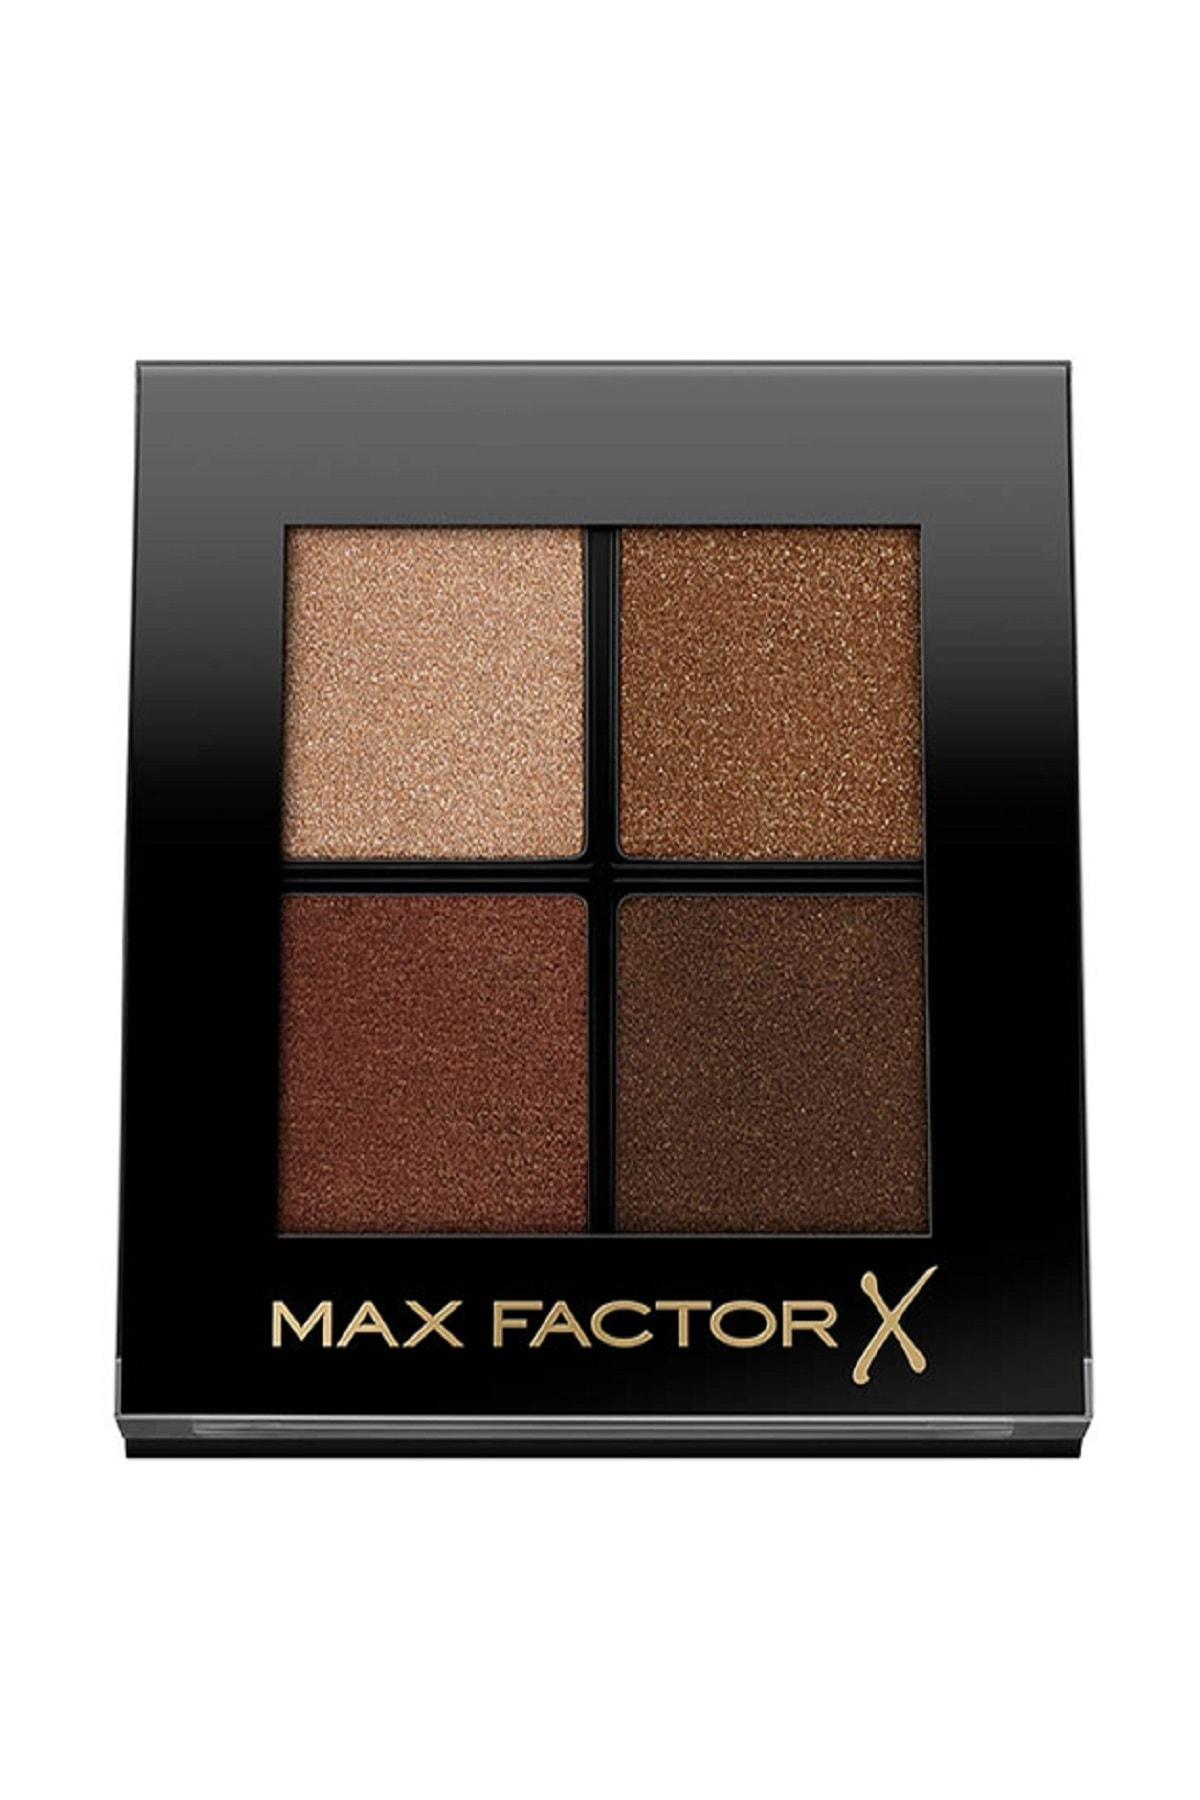 Max Factor Colour X-pert Soft Touch Palette 004 Veiled Bronze 1